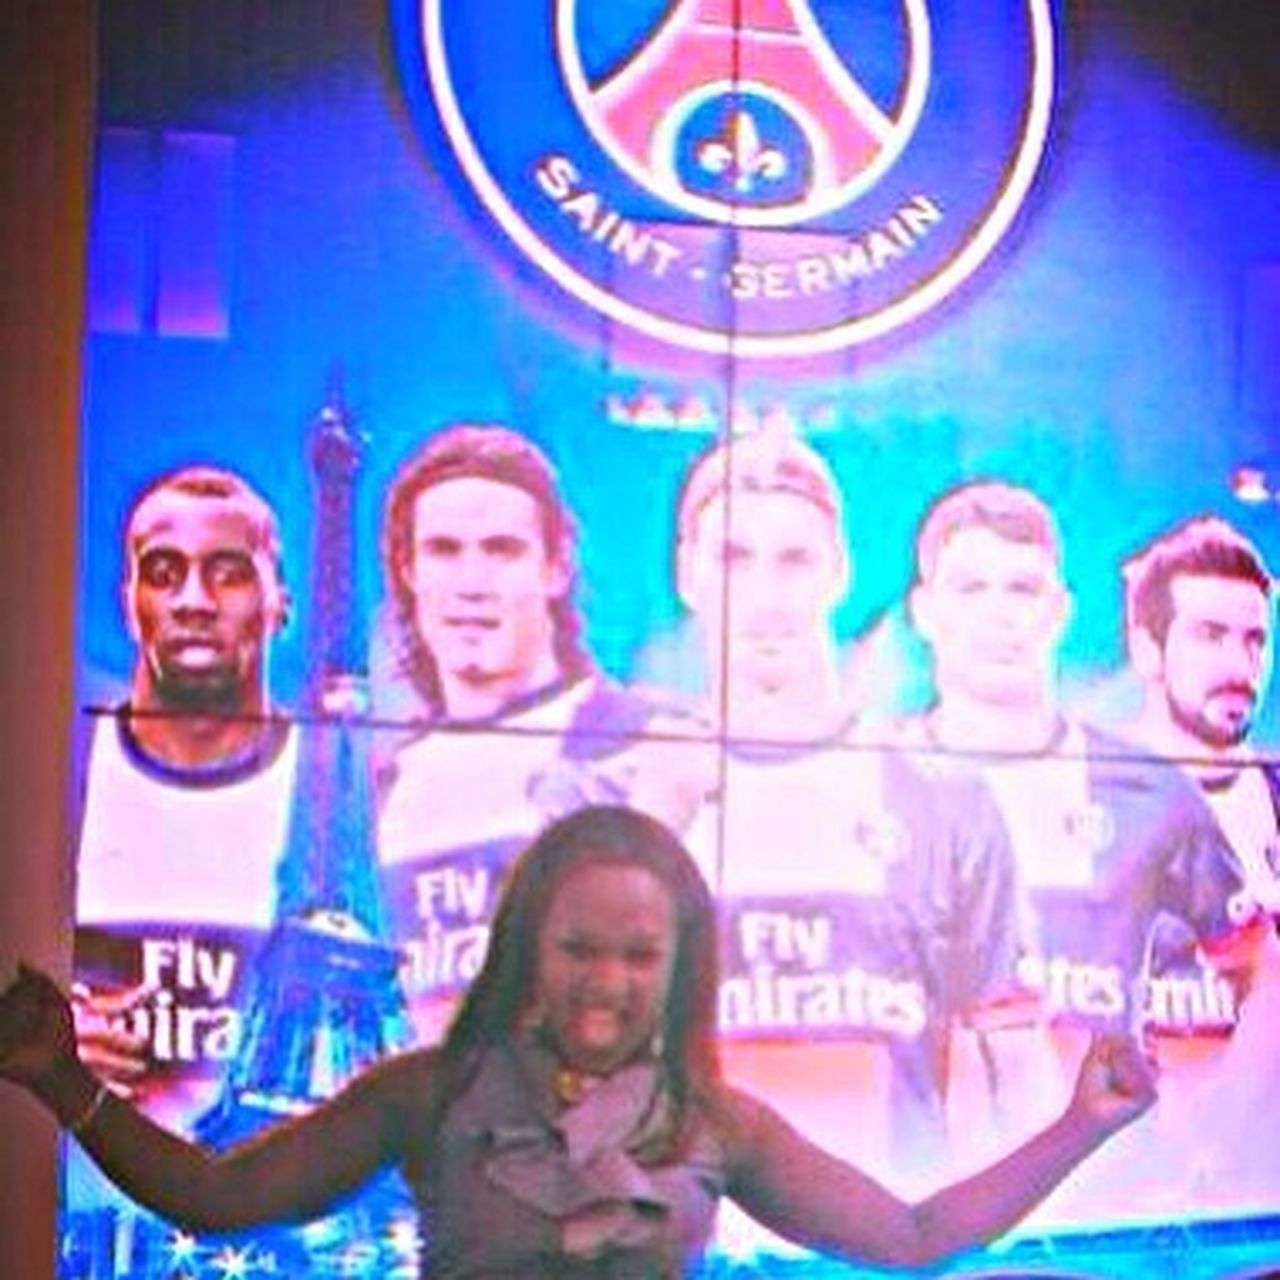 Paris Saint Germain Paris Saint Germain. ❤ Parissaintgermain PSG  Psg ♥ PSG✨ Doha Qatar Doha#City#❤ Flyemirates